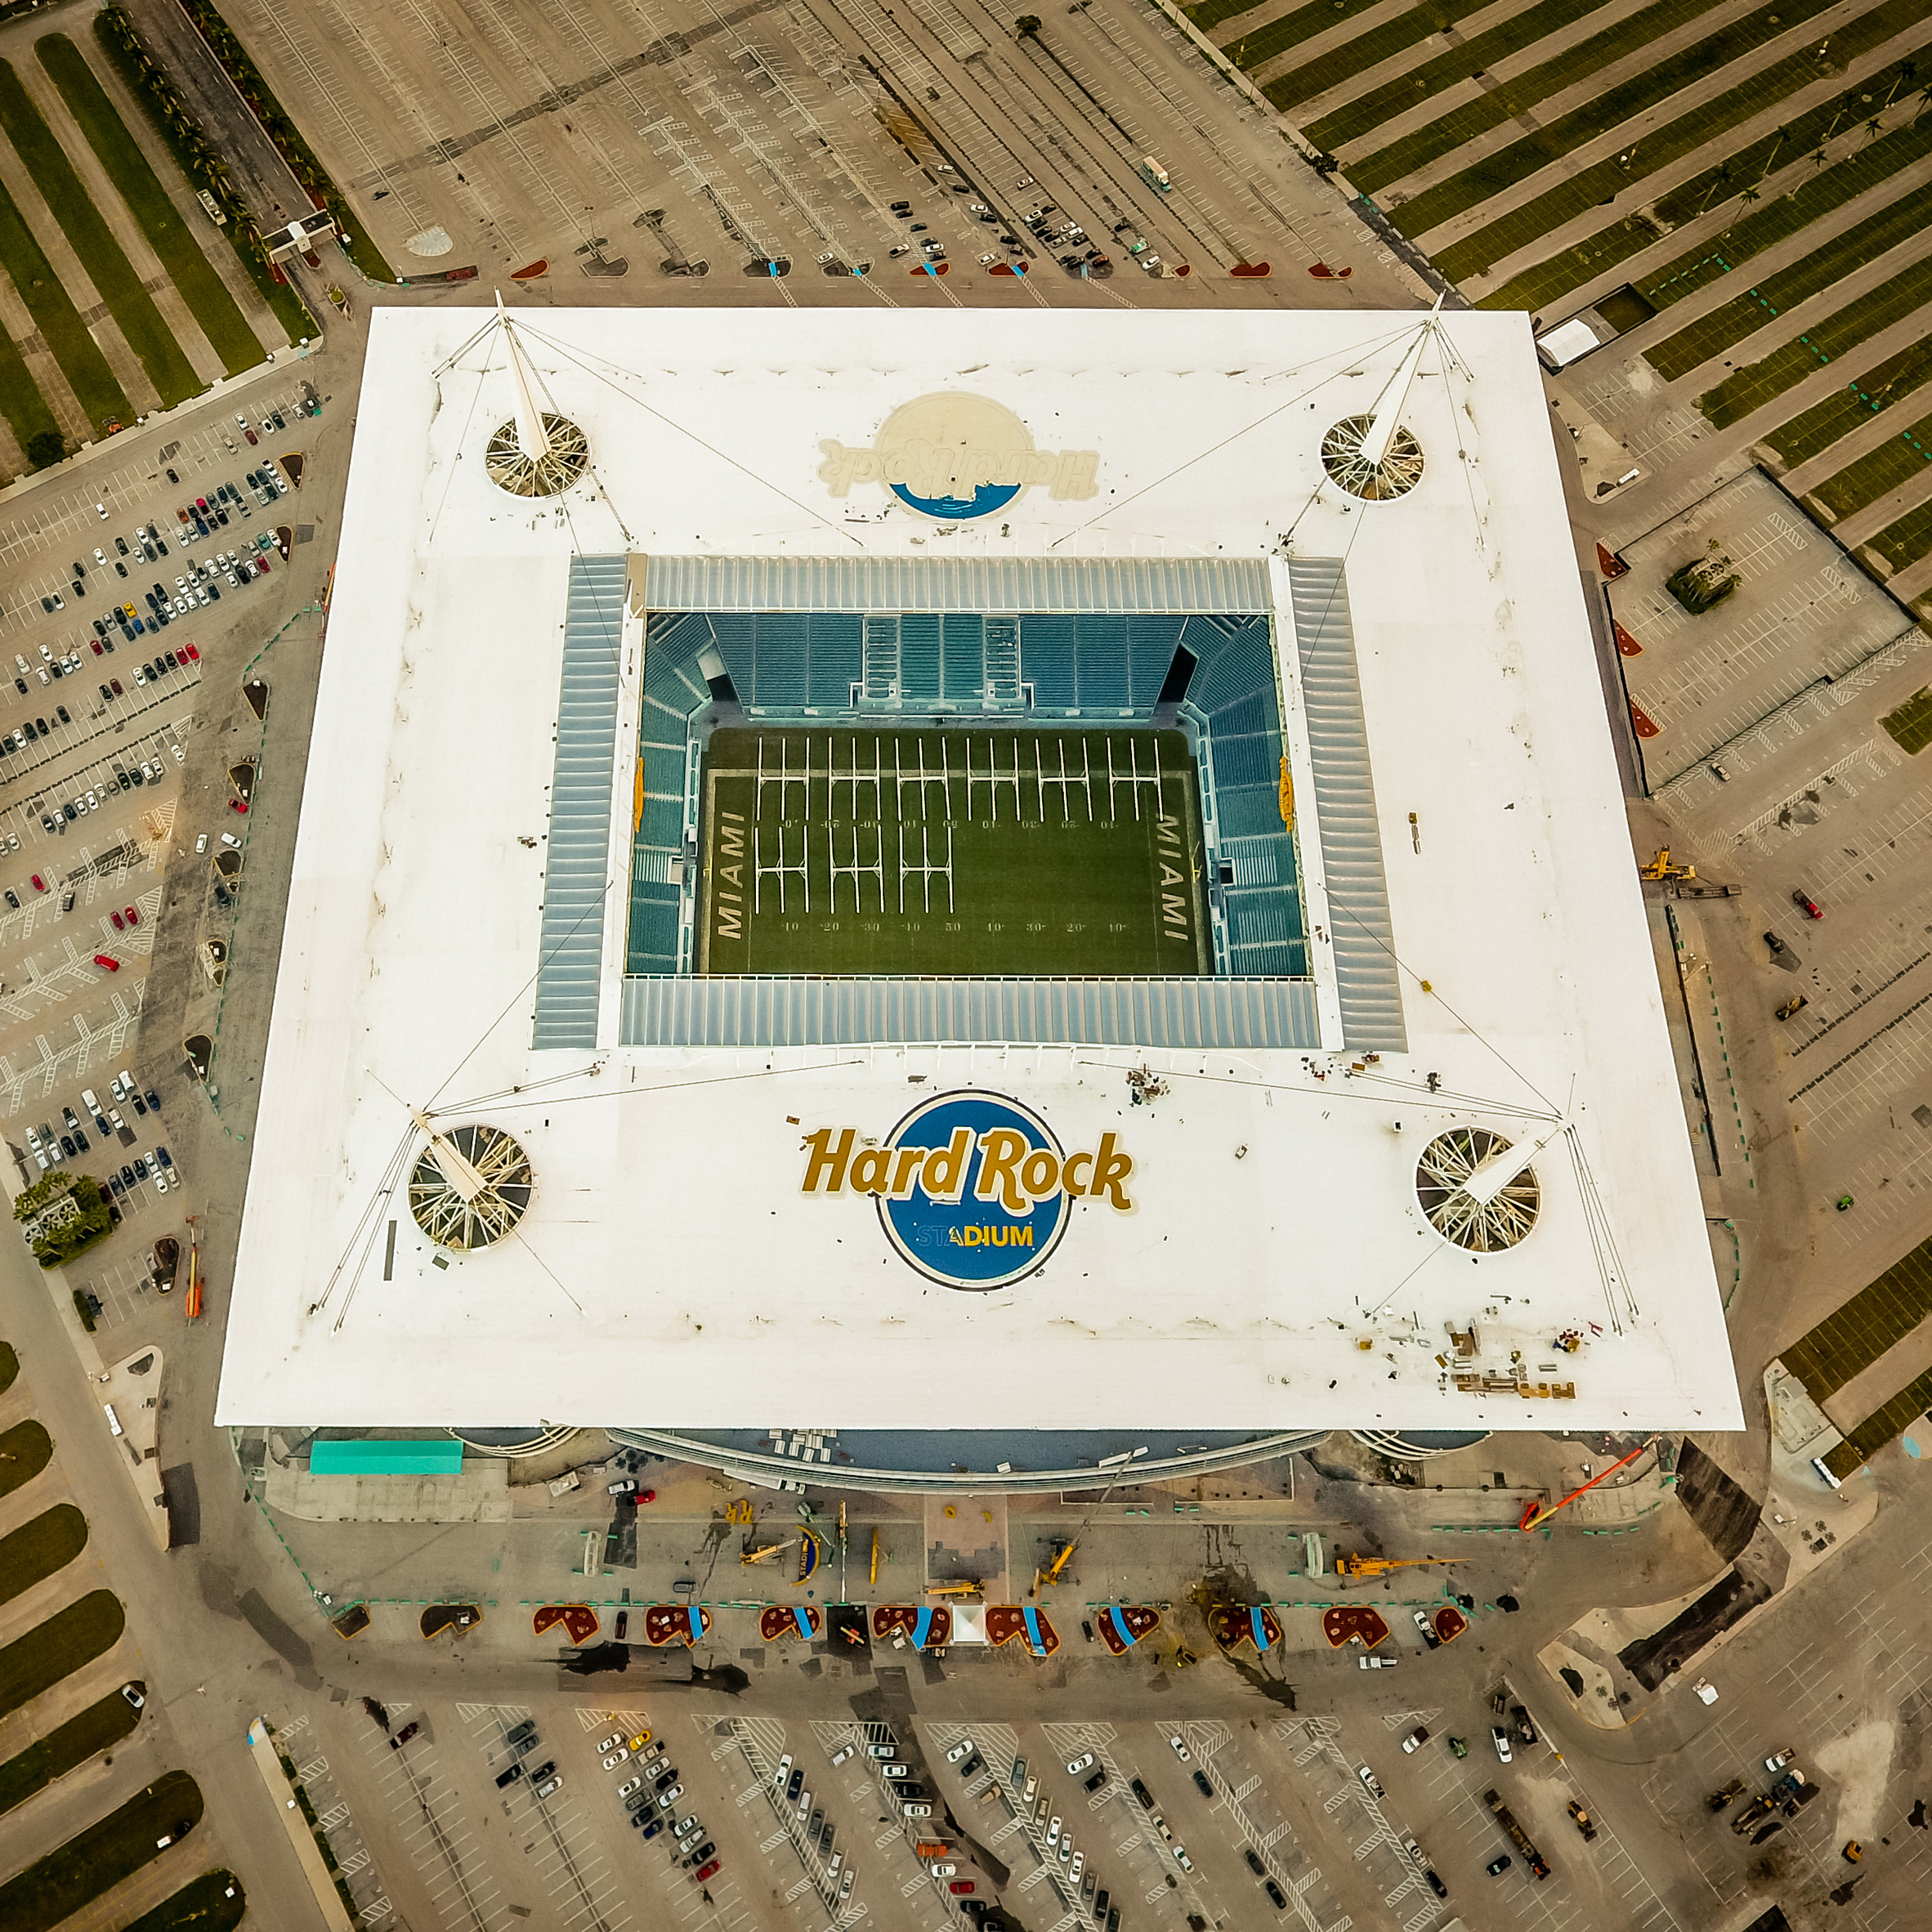 Hard Rock Stadium by Populous, Miami, Florida